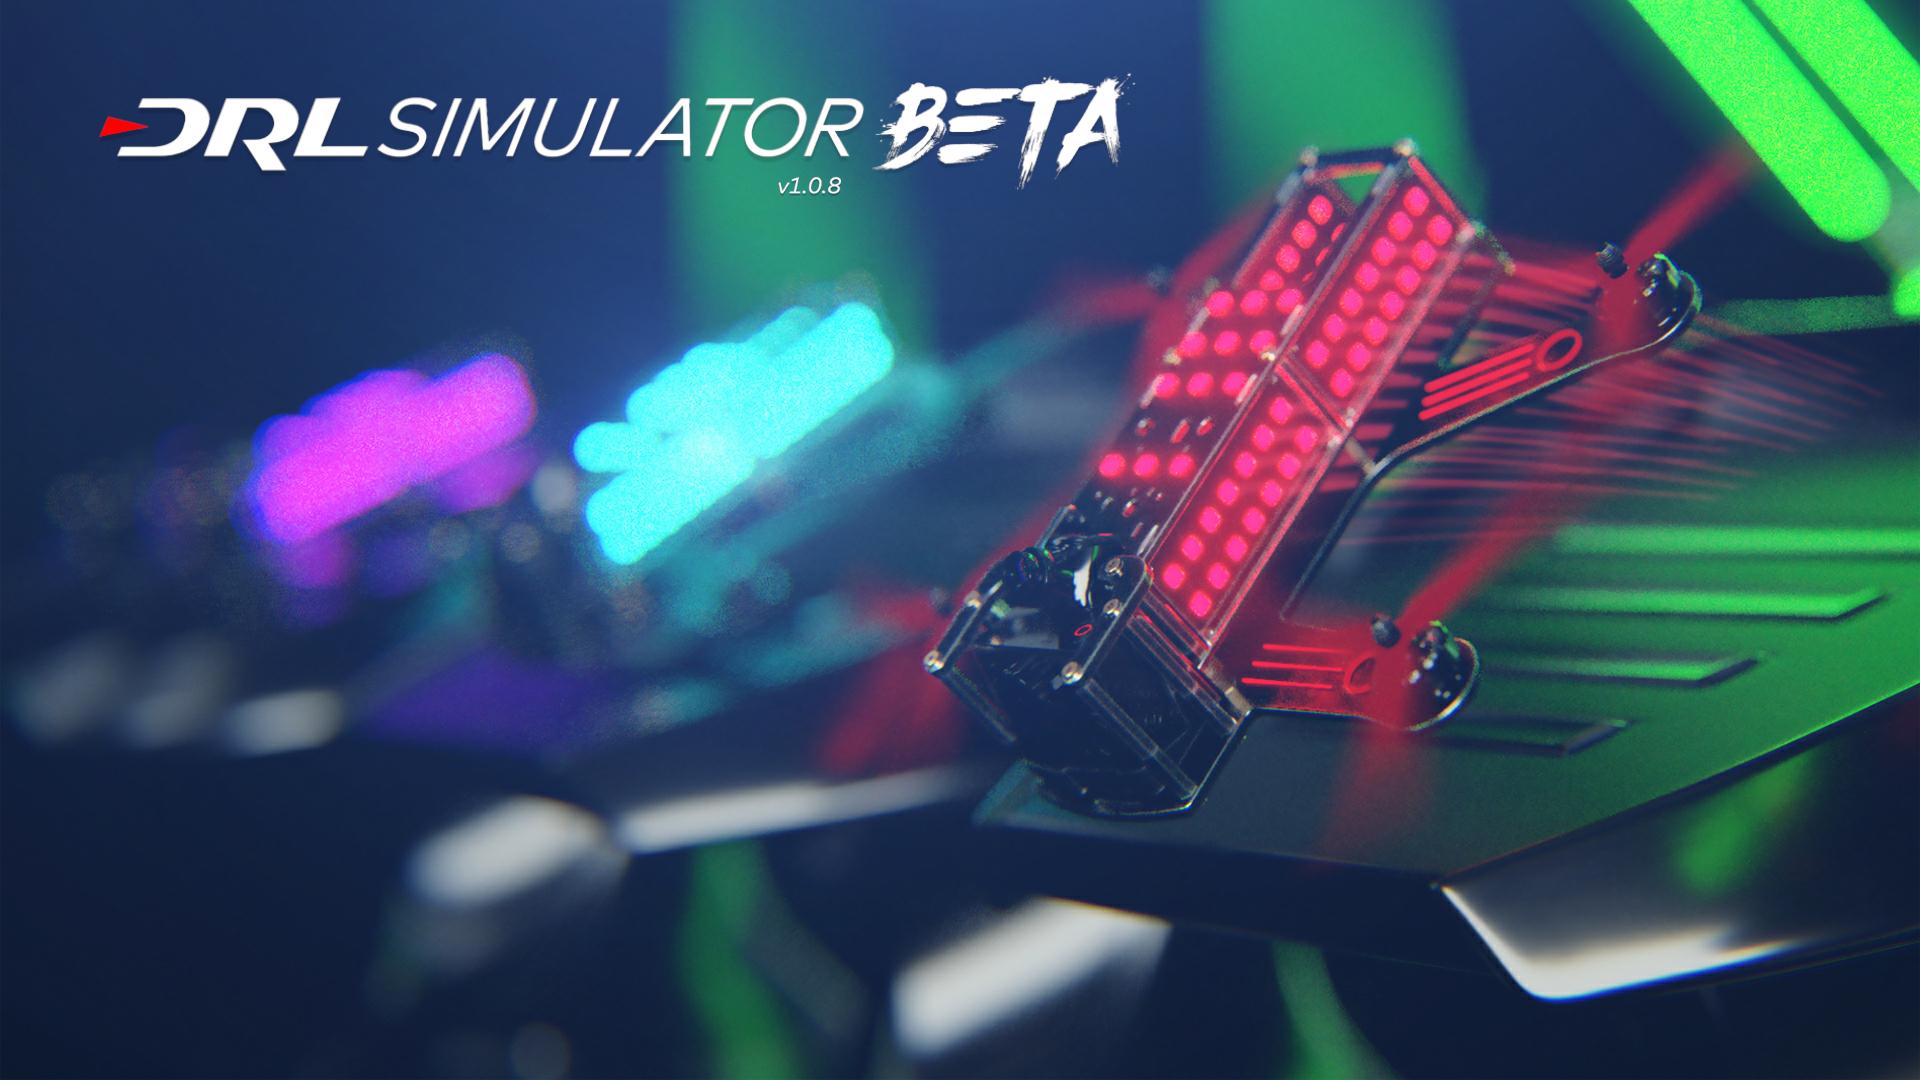 DRL Simulator